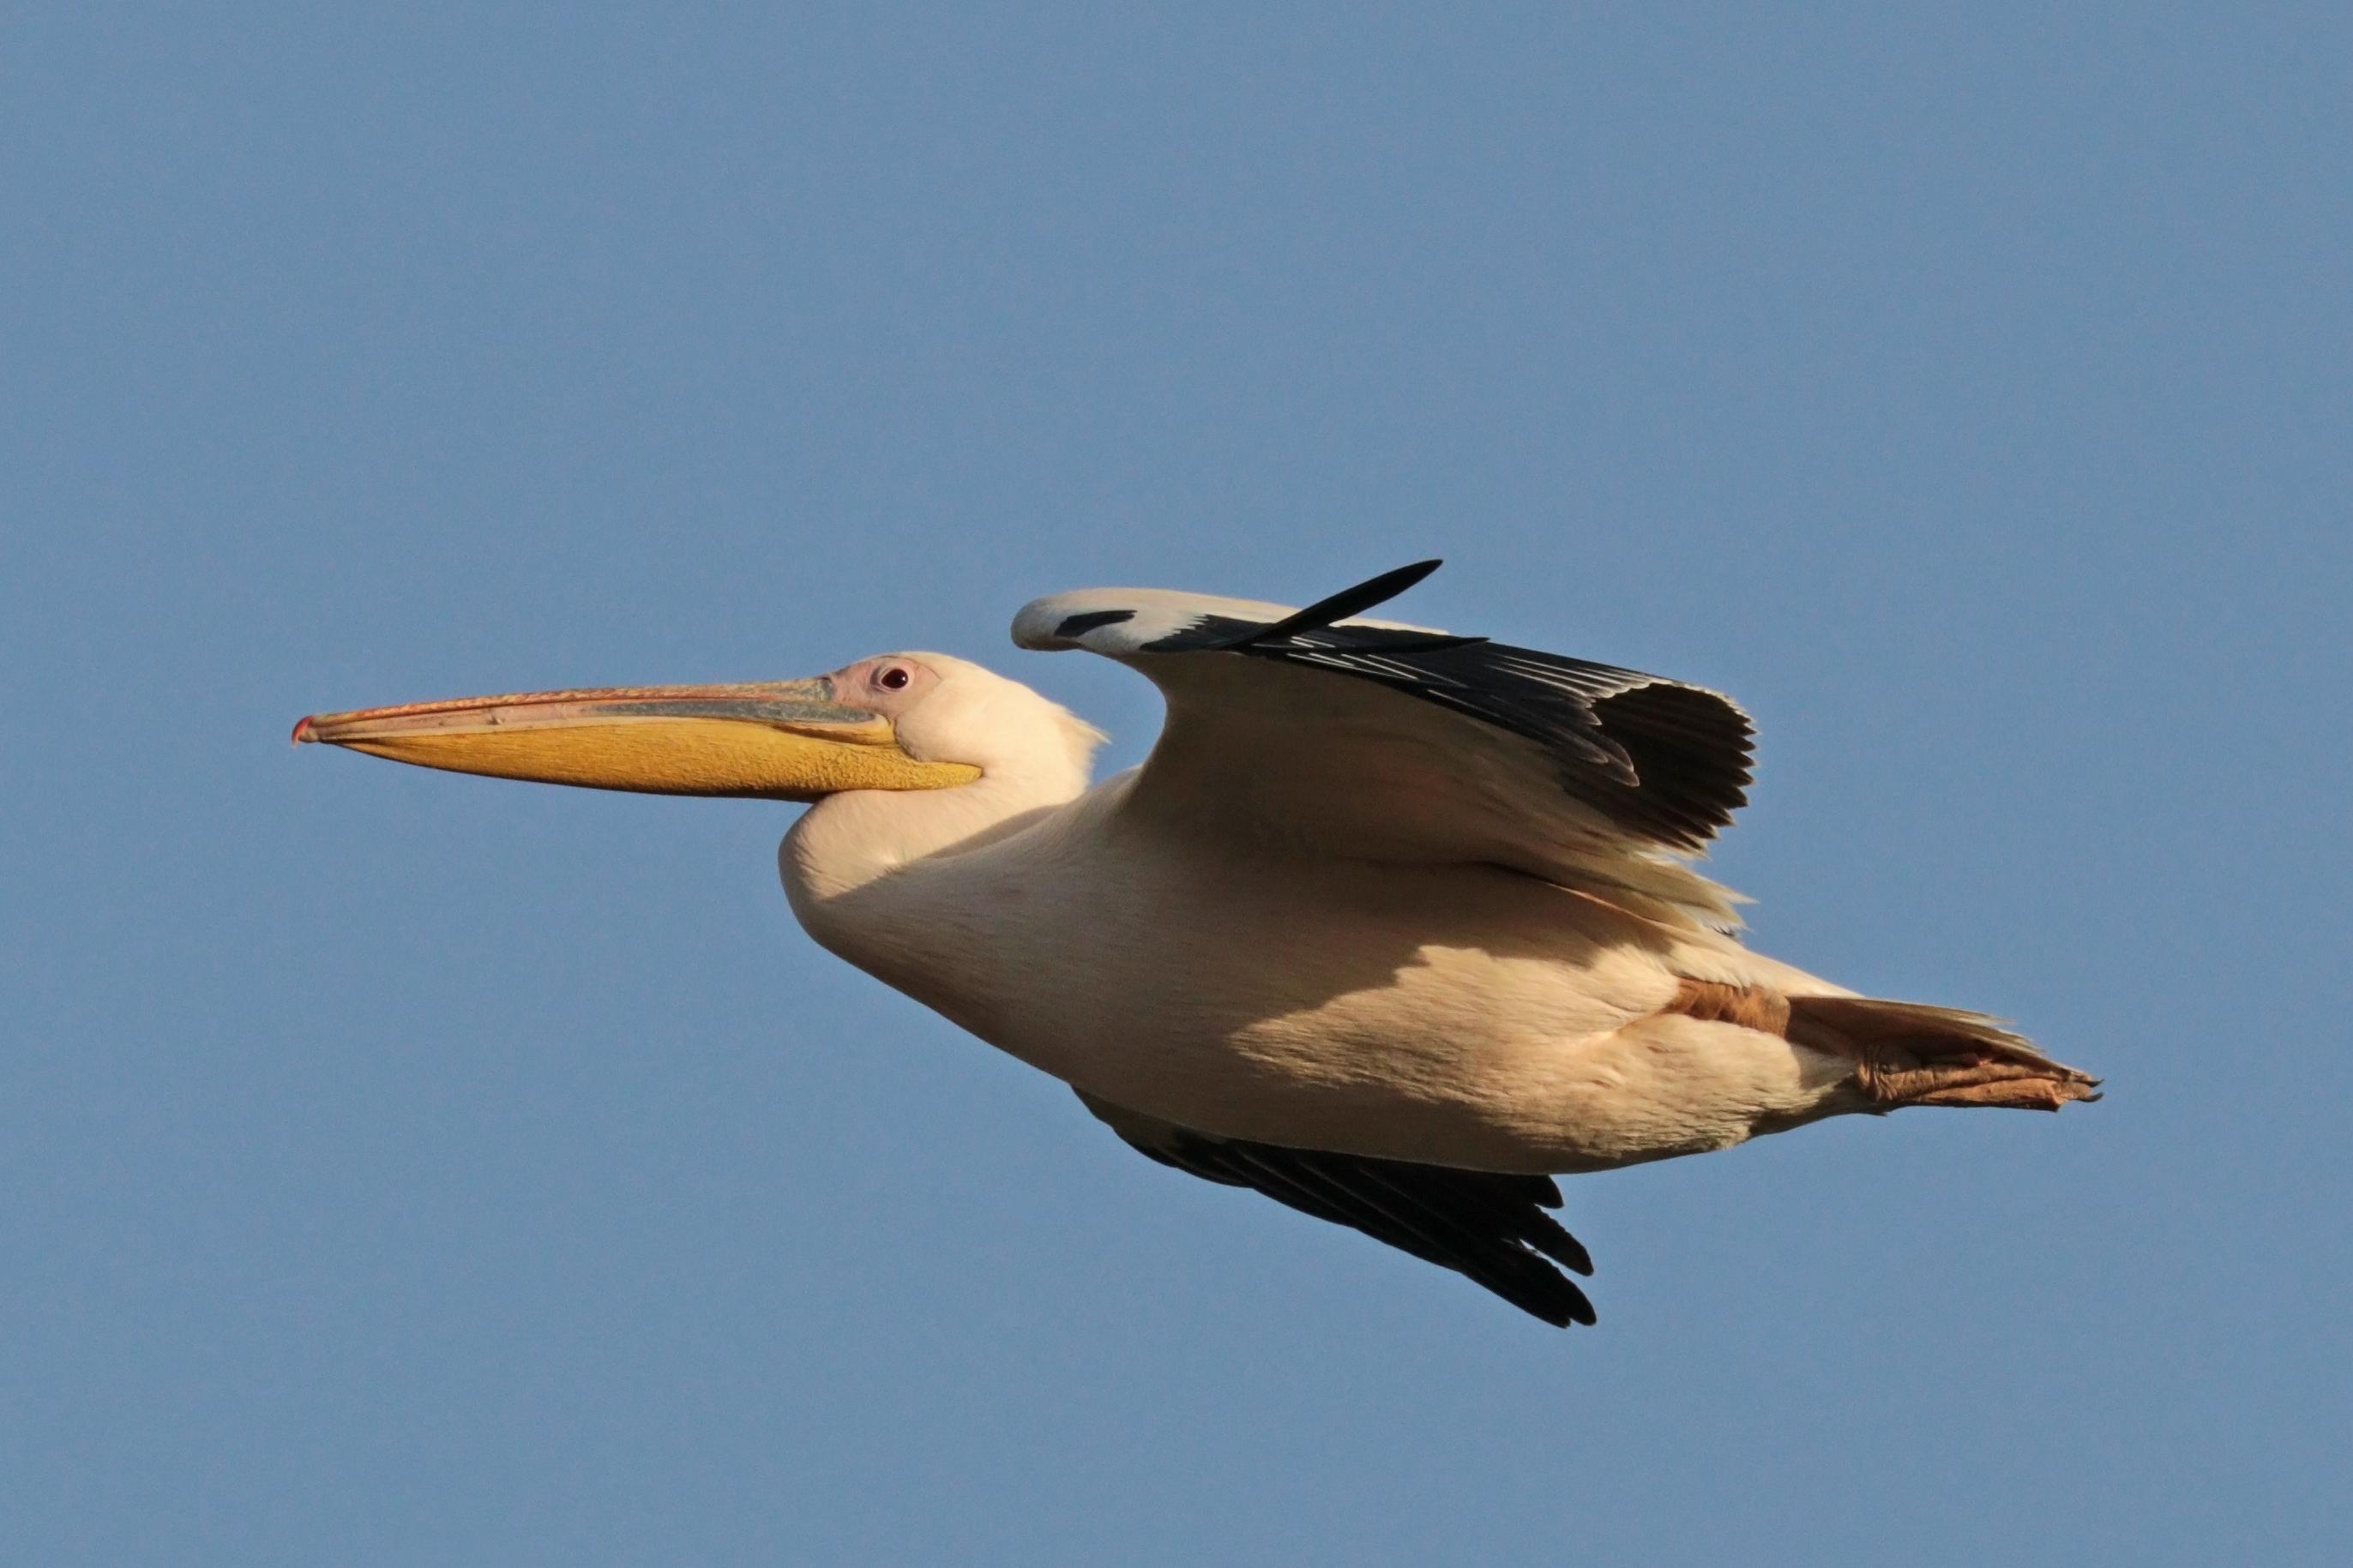 Great white pelican (Pelecanus onocrotalus) in flight over Lake Ziway, Ethiopia. Photo taken on December 20, 2017.